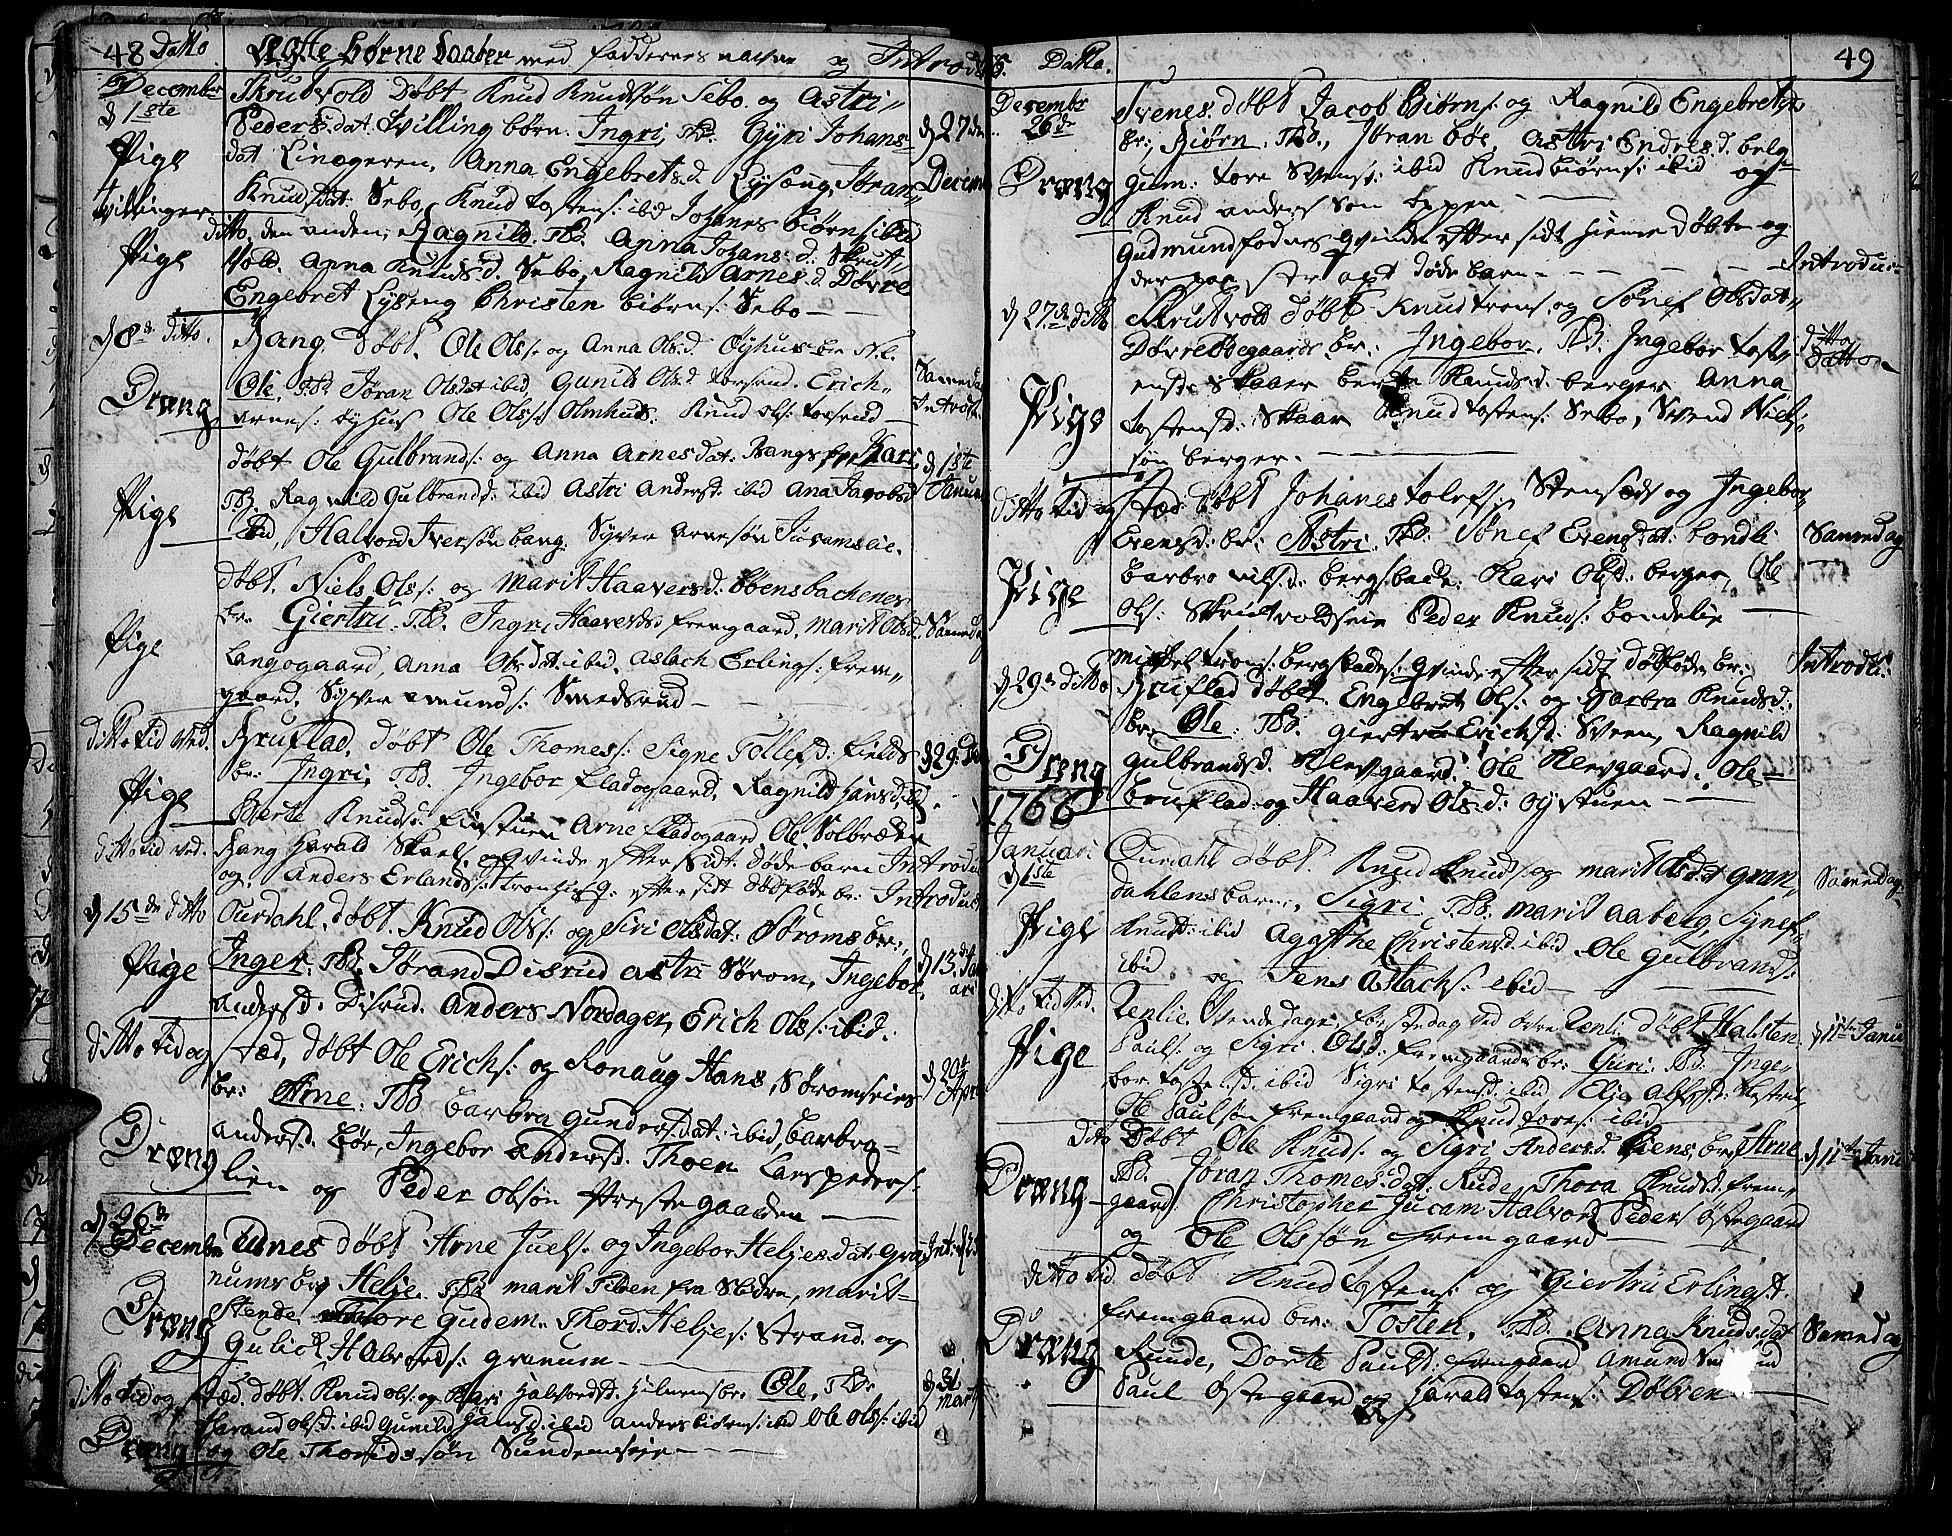 SAH, Aurdal prestekontor, Ministerialbok nr. 5, 1763-1781, s. 48-49